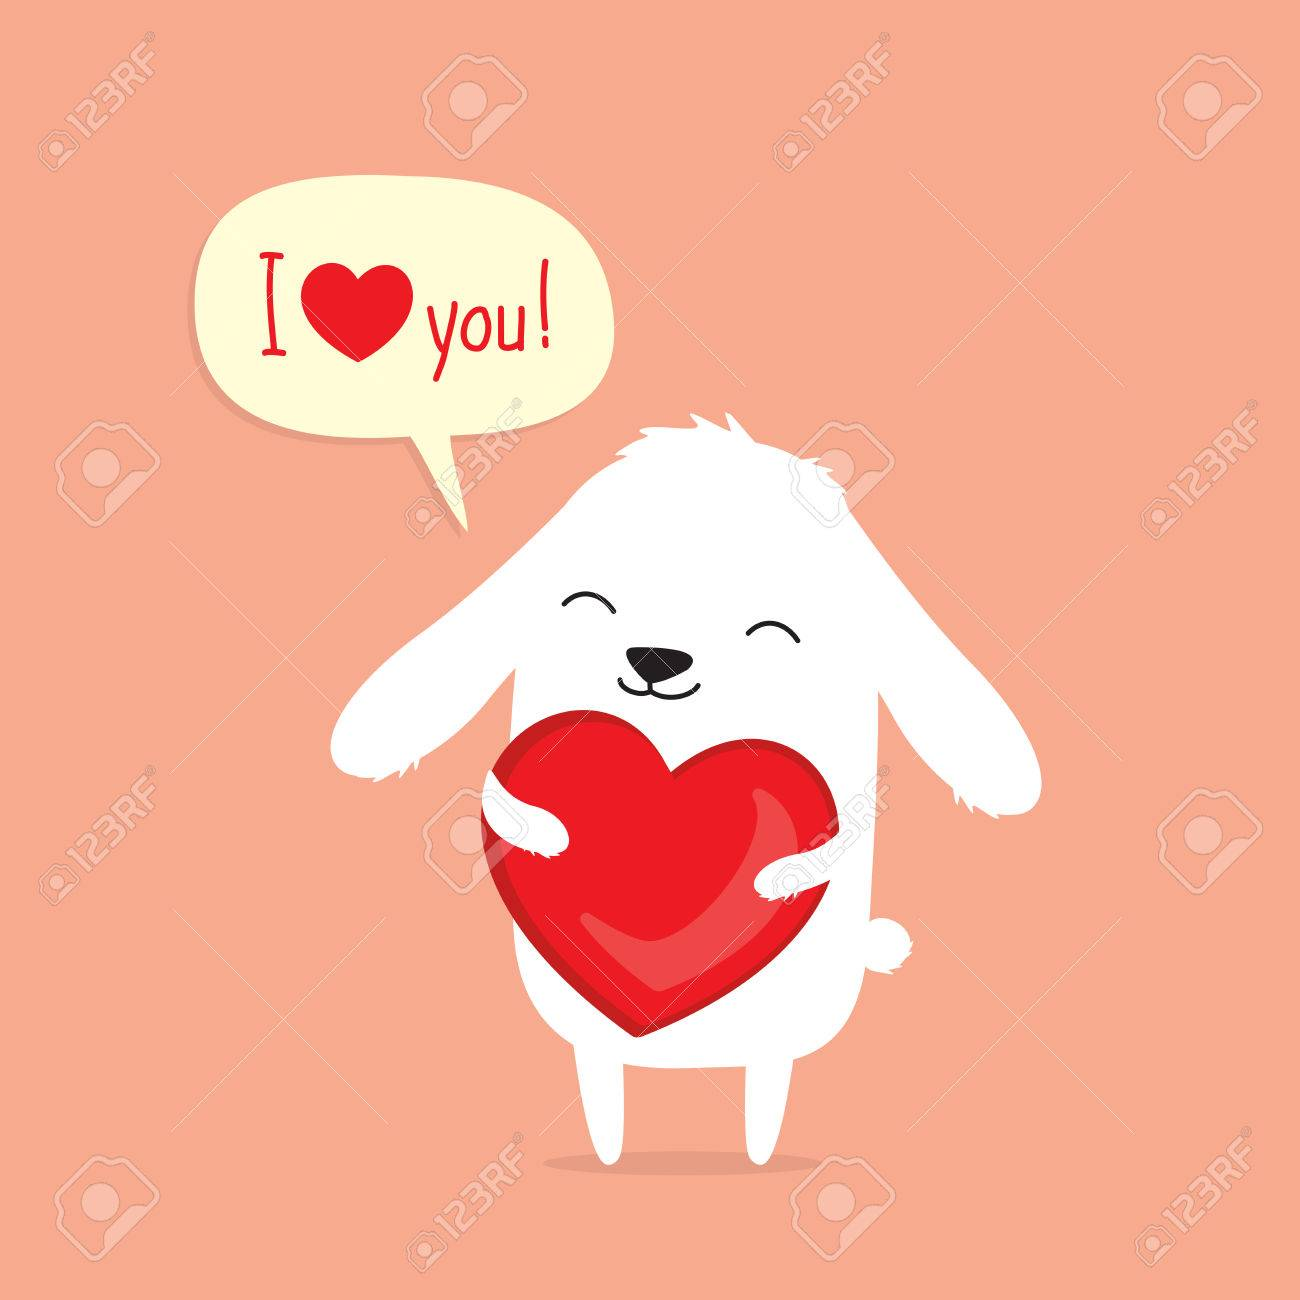 Tarjeta De San Valentin Con Conejo De Conejito De Dibujos Animados